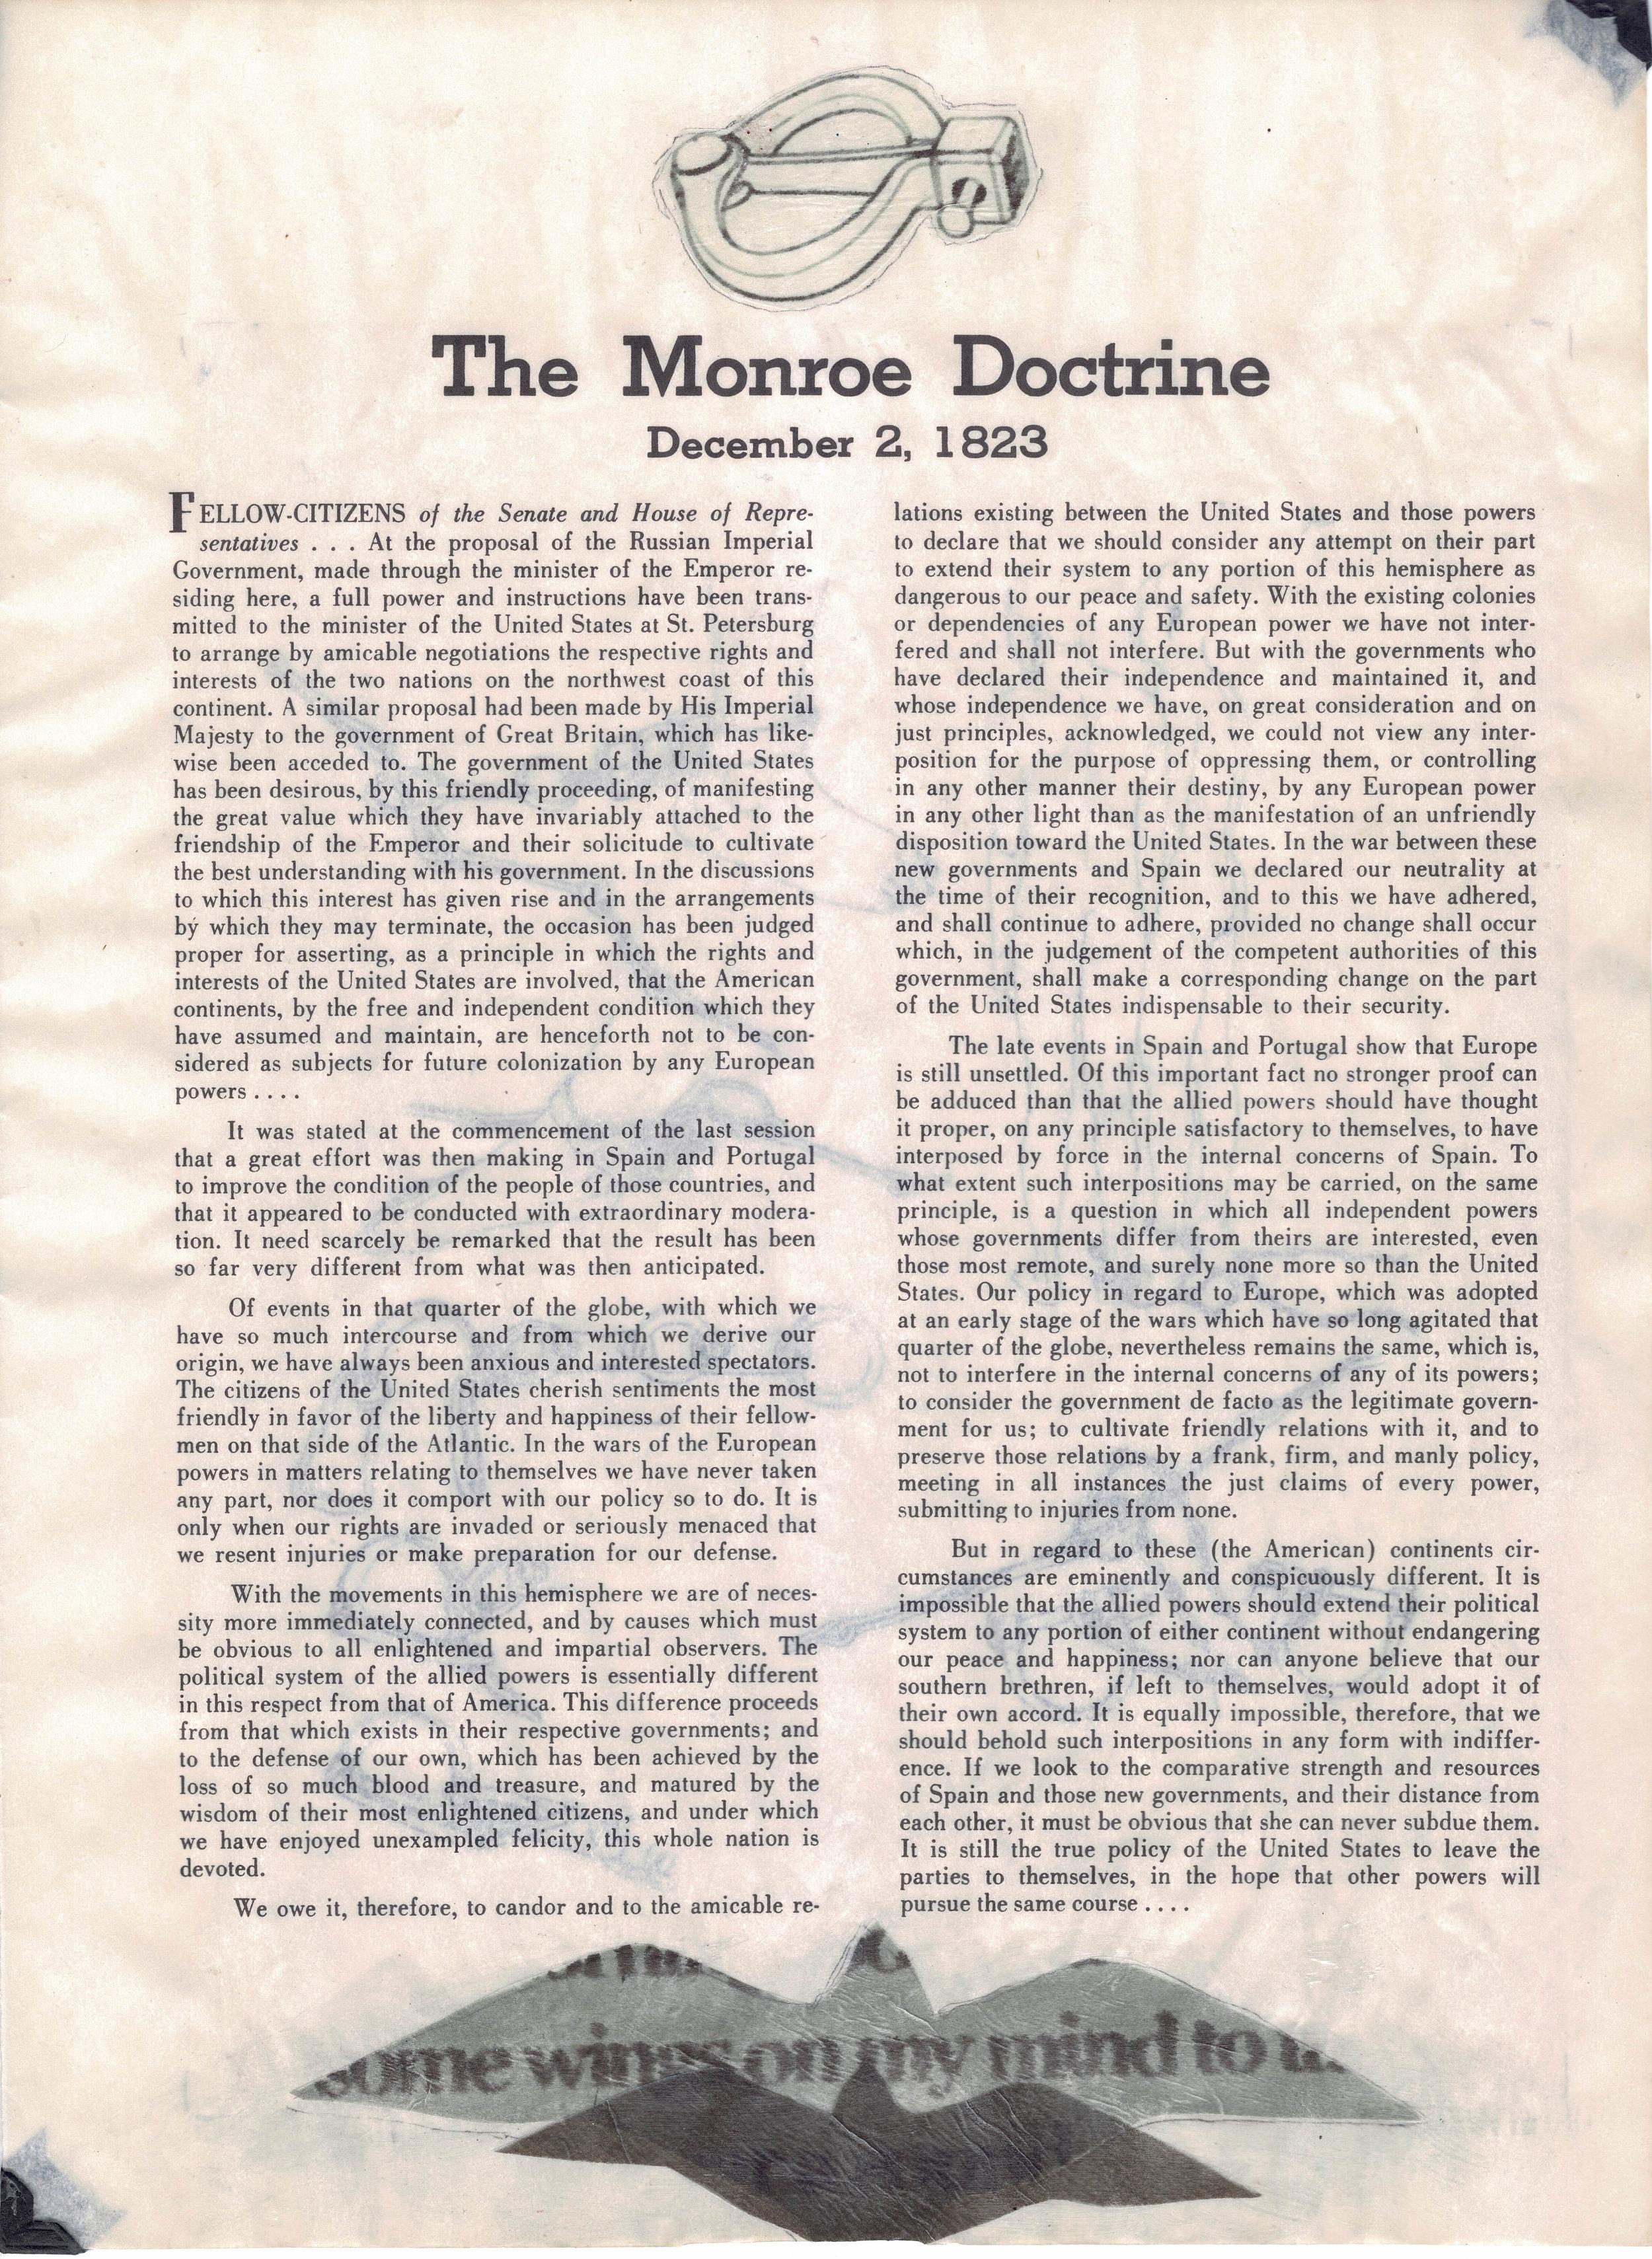 drék davis, 8. Liberty Annotated, The Monroe Doctrine (2018) med.jpg